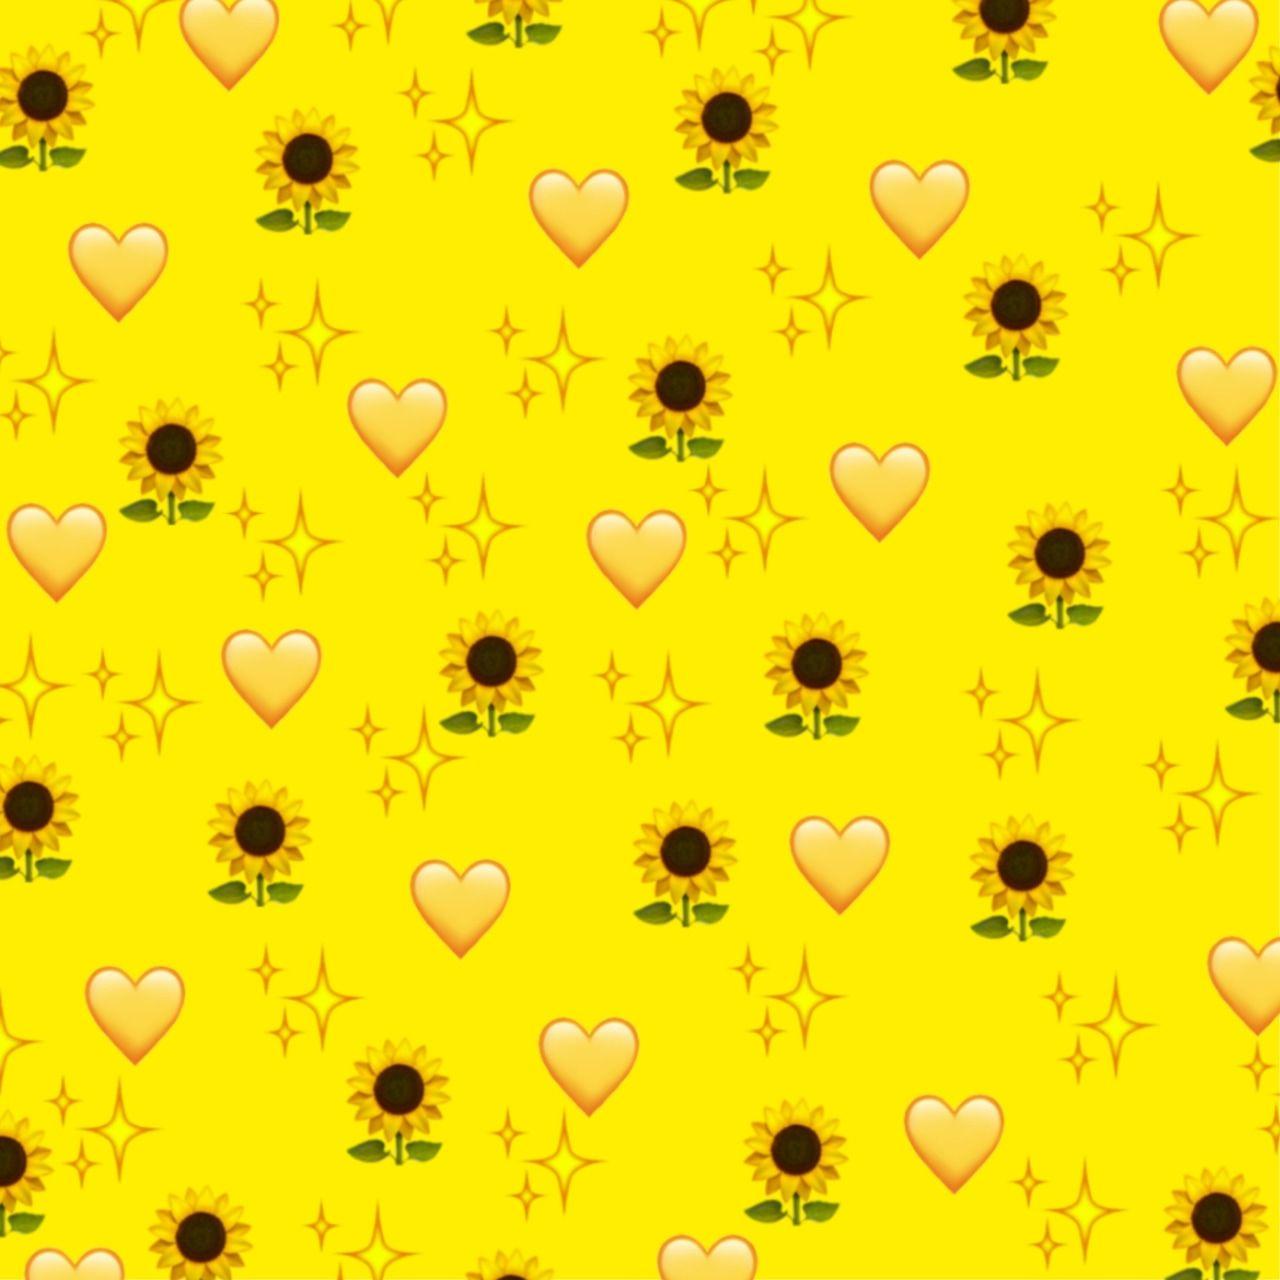 aesthetic emoji wallpapers